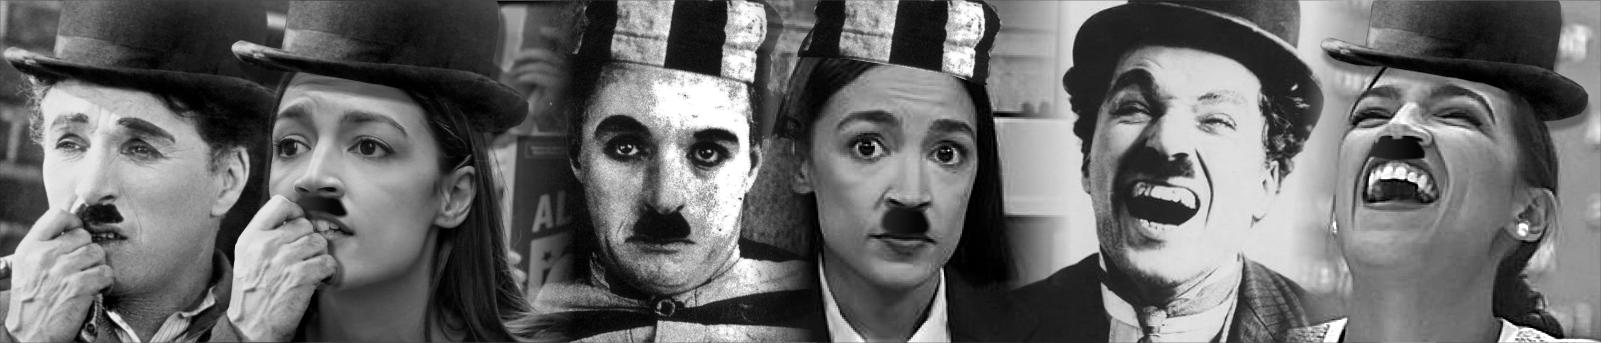 Alexandria Ocasio-Cortez Charlie Chaplin